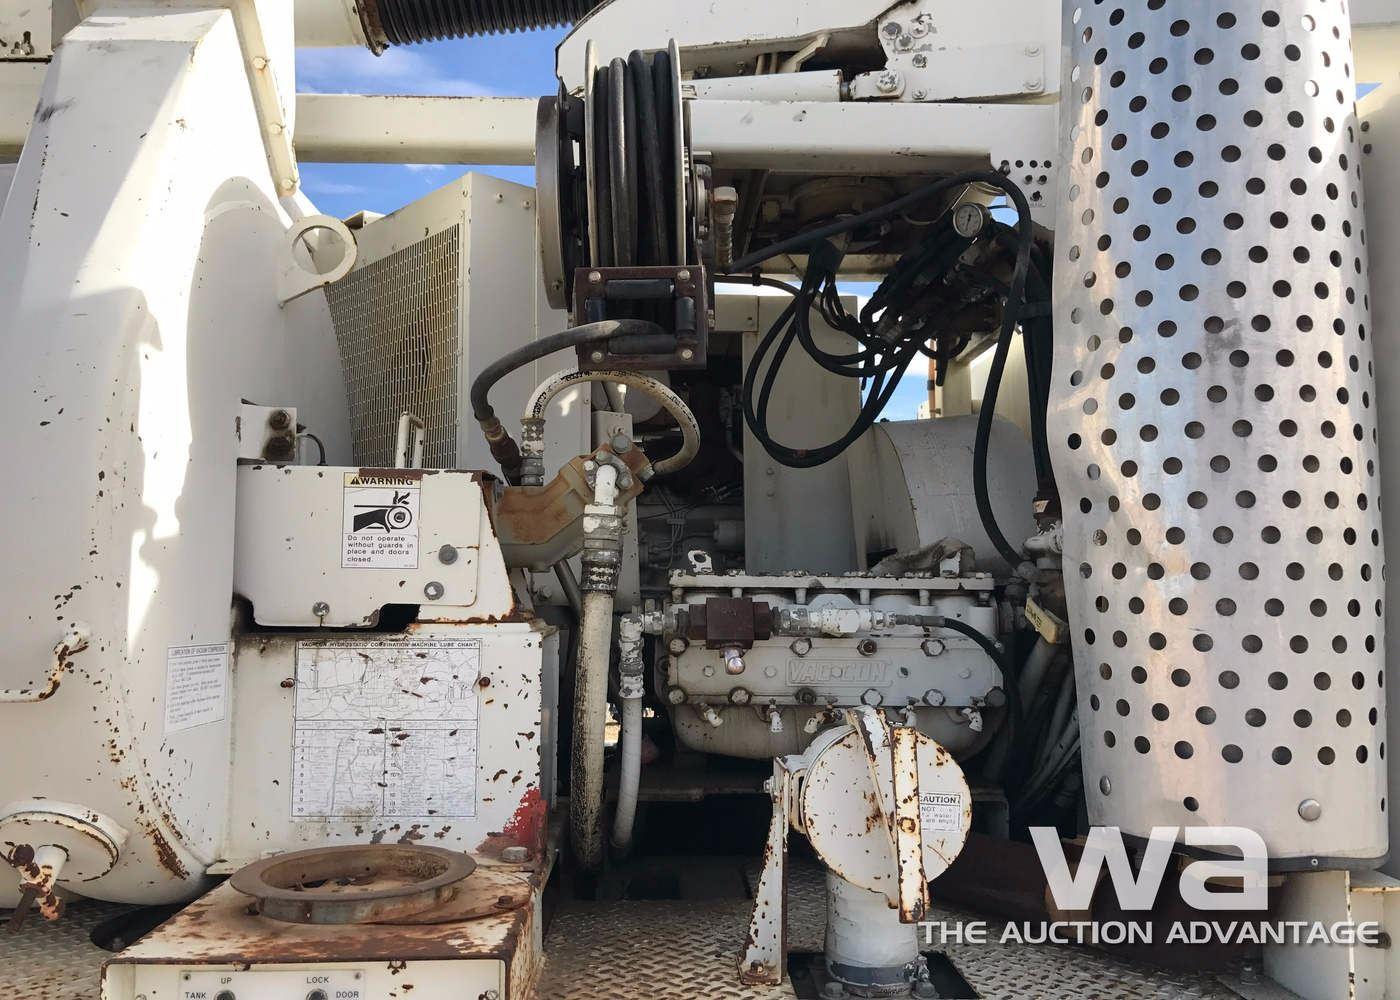 image 10 : 1997 ford l8000 s/a hydro vac